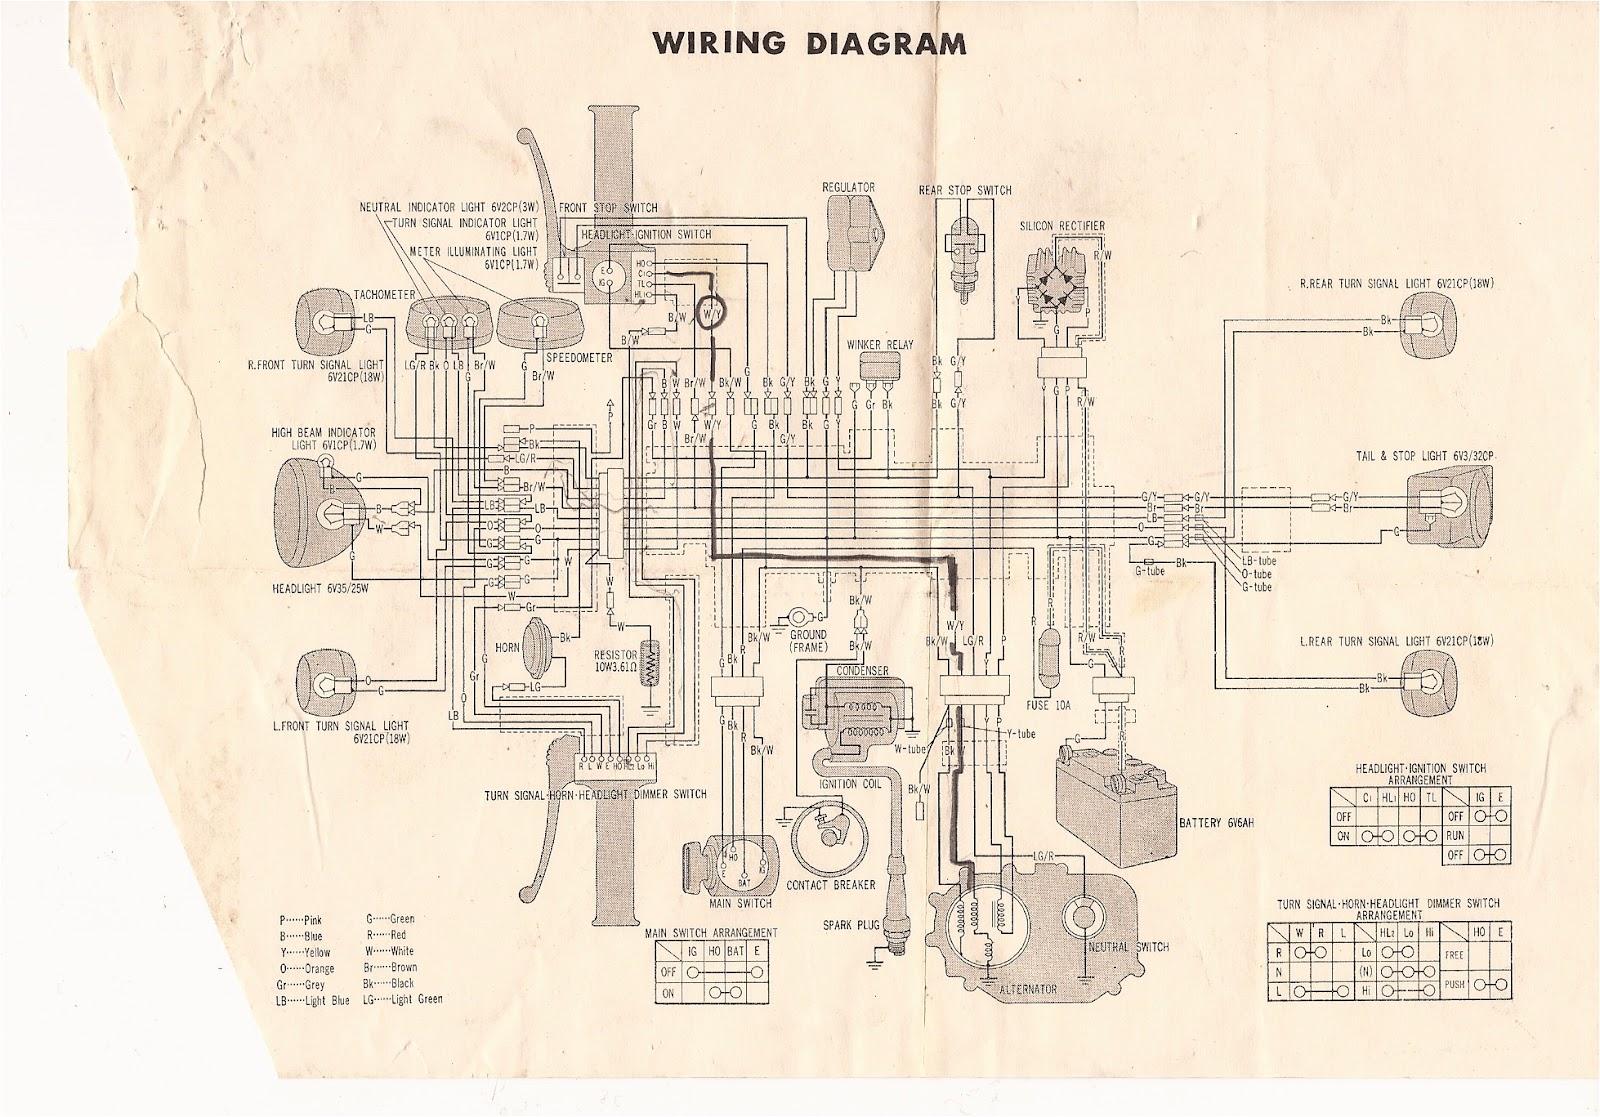 92 Toyota Pickup Wiring Diagram - Roslonek.net